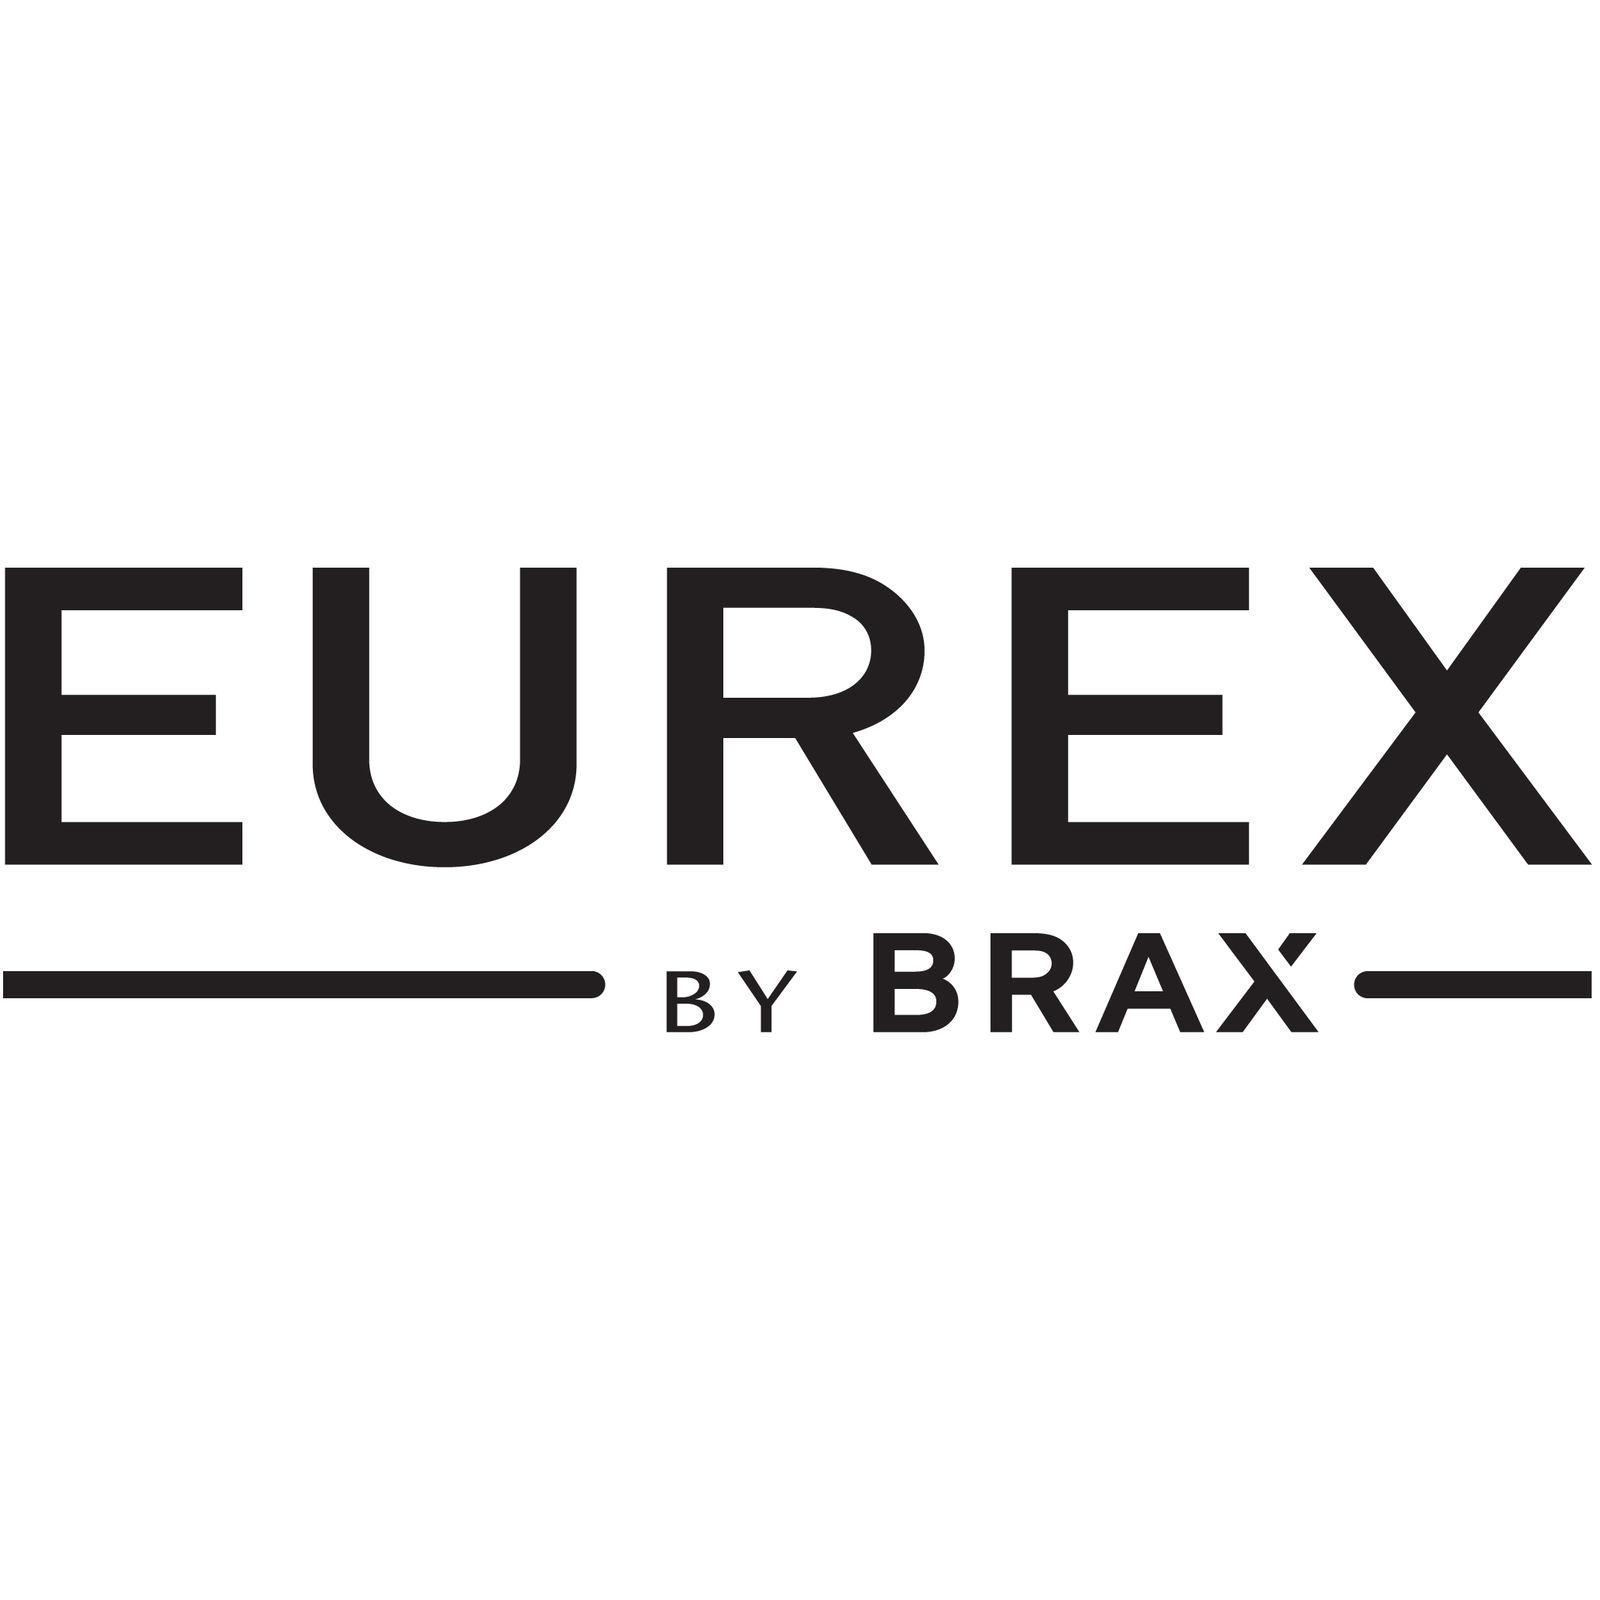 EUREX by BRAX (Image 1)